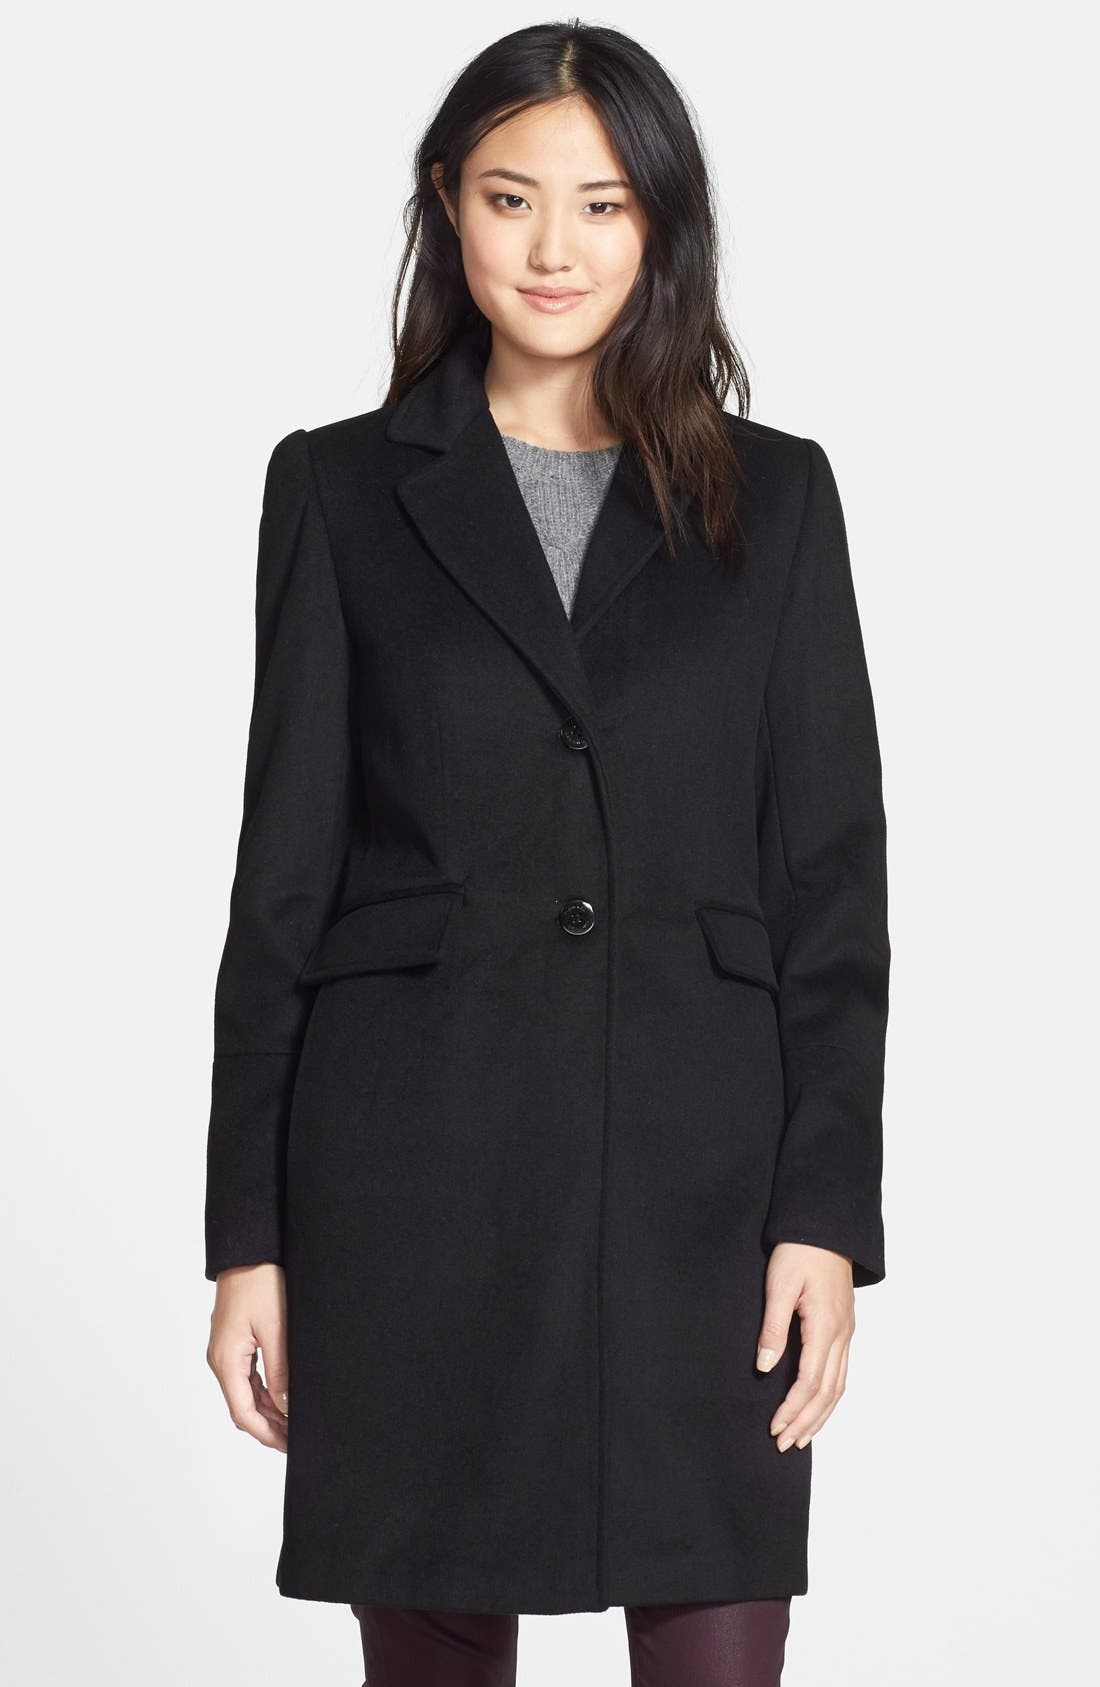 CALVIN KLEIN Notch Collar Wool Blend Coat, Main, color, 001